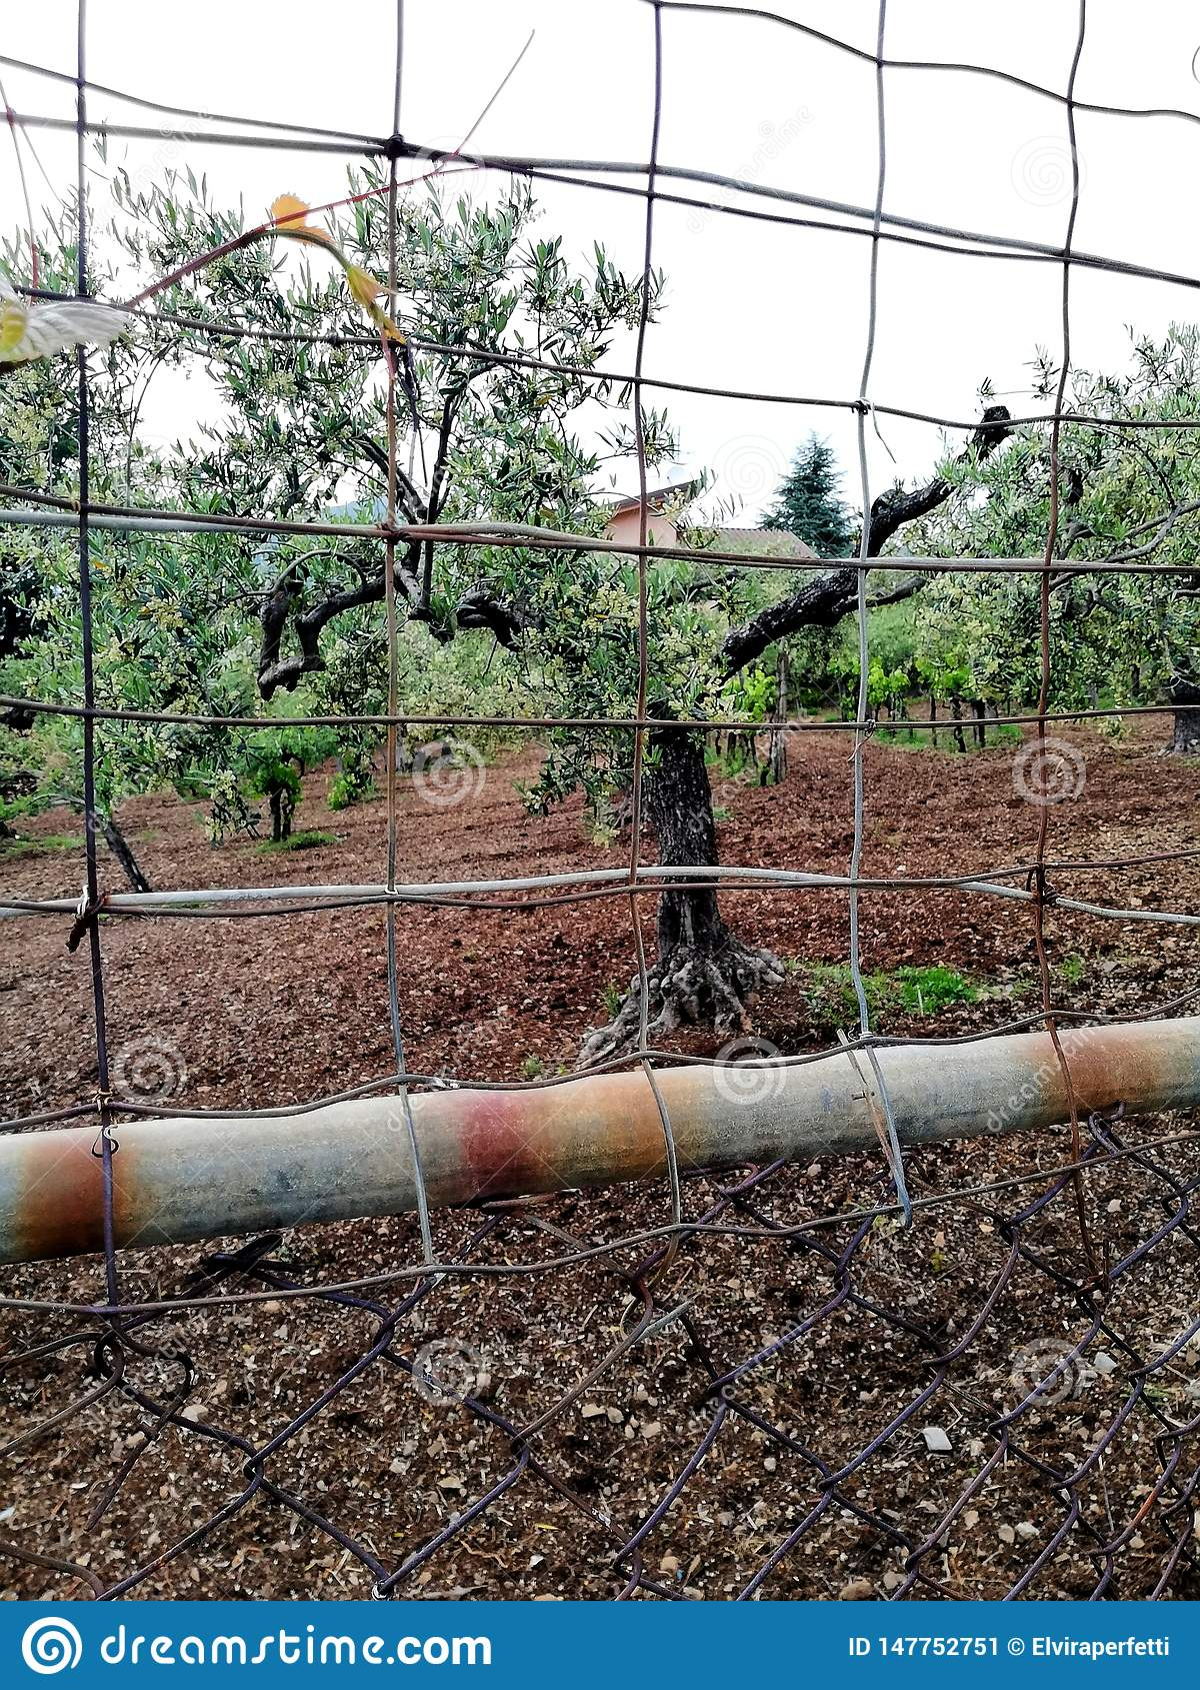 Calabrese额外处女橄榄油的优秀生产的橄榄树